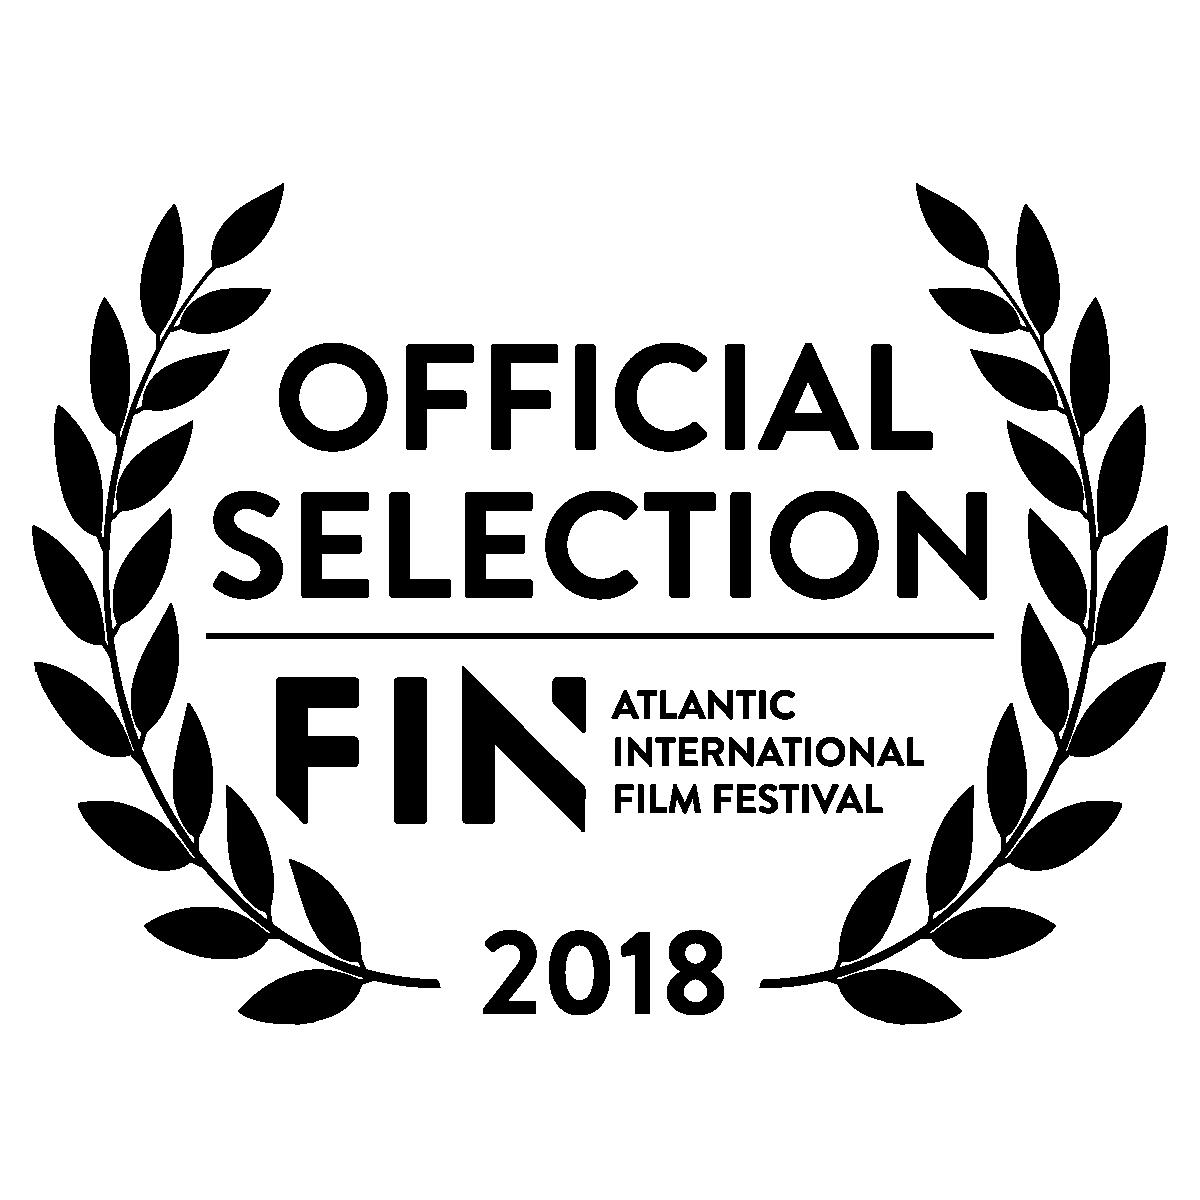 FIN_Festival-2018-Laurels-Official_Selection.png